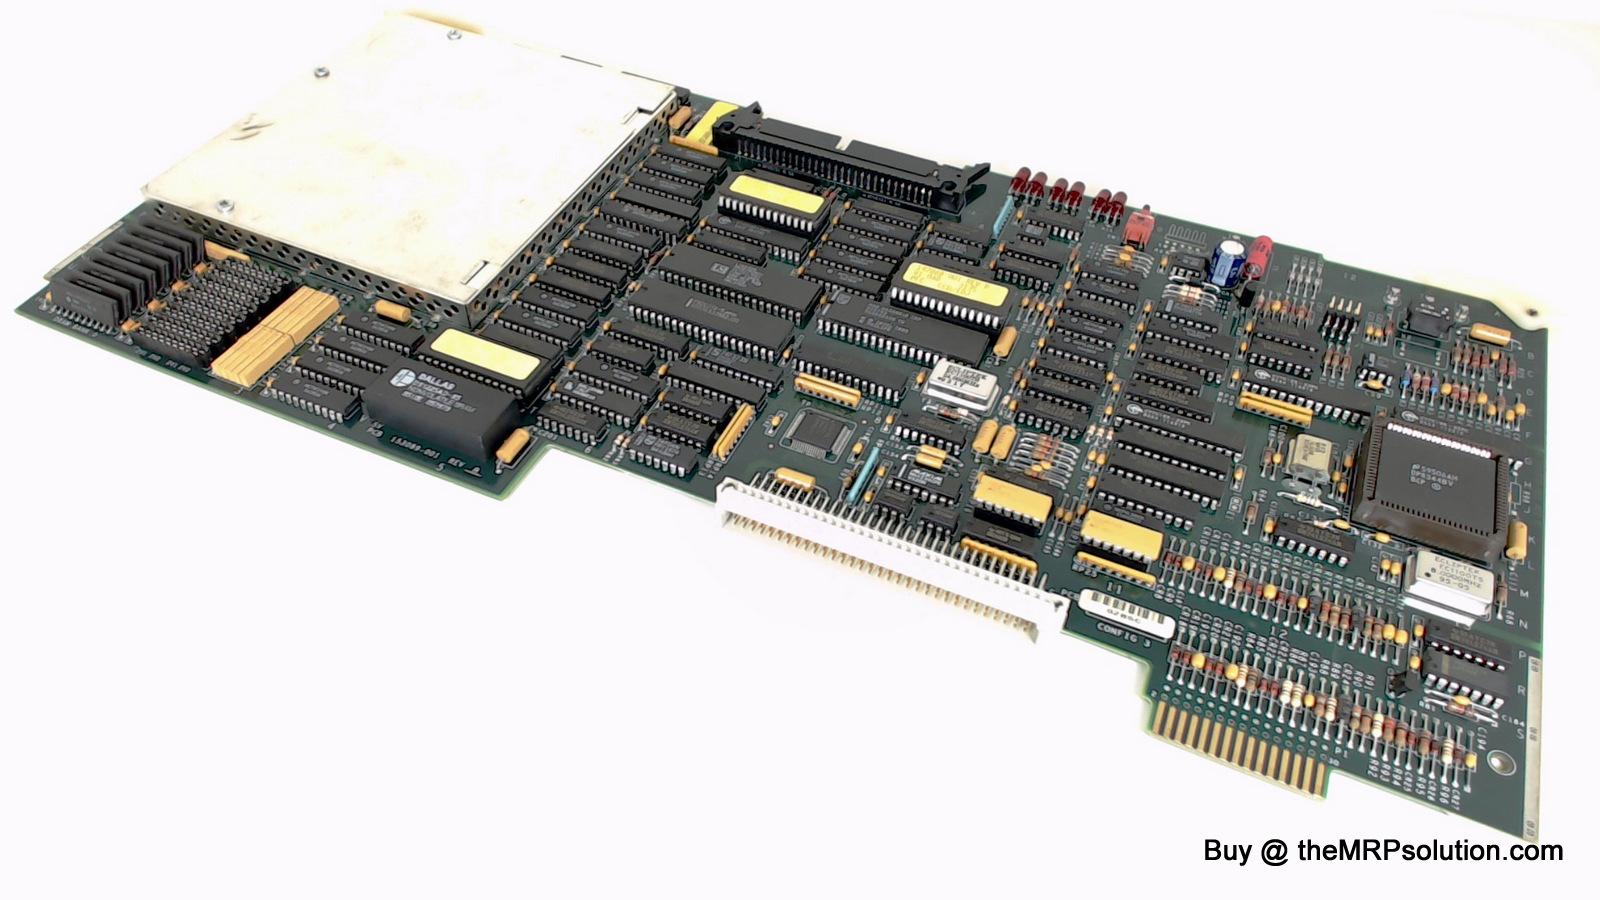 IBM 10R3928 PCBA, LP30-CT, V3, 6408 Refurbished